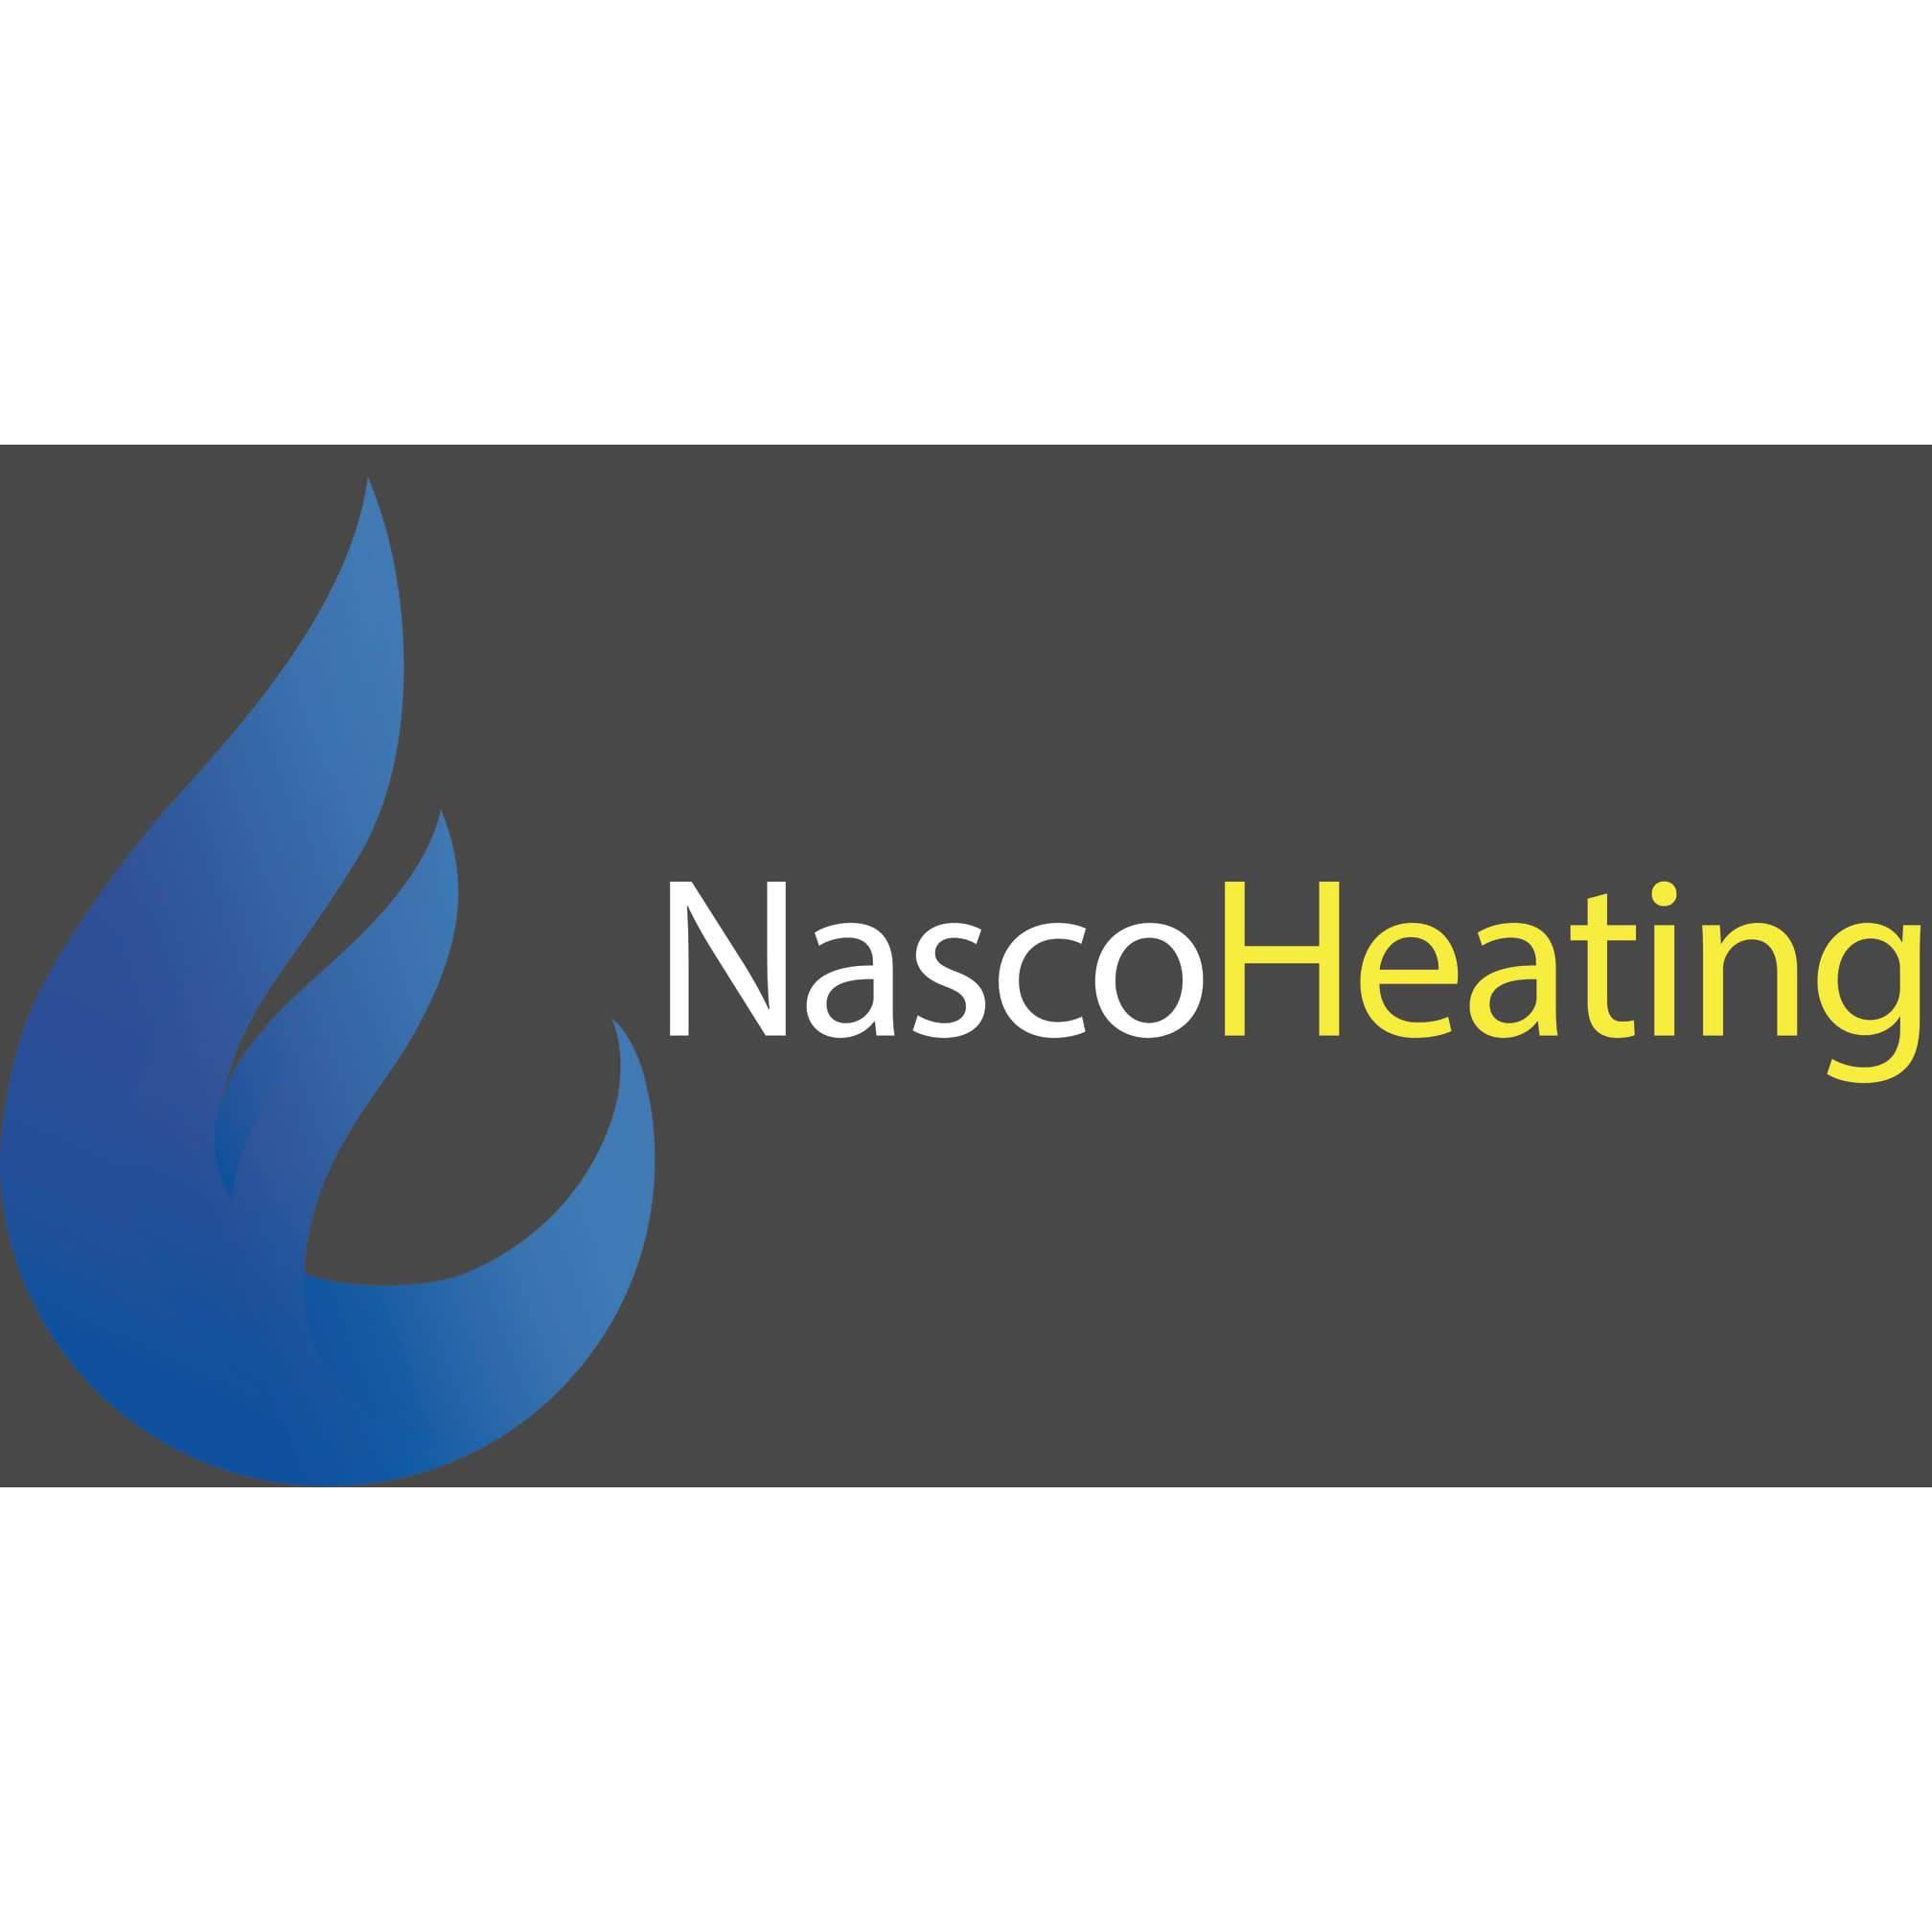 NascoHeating